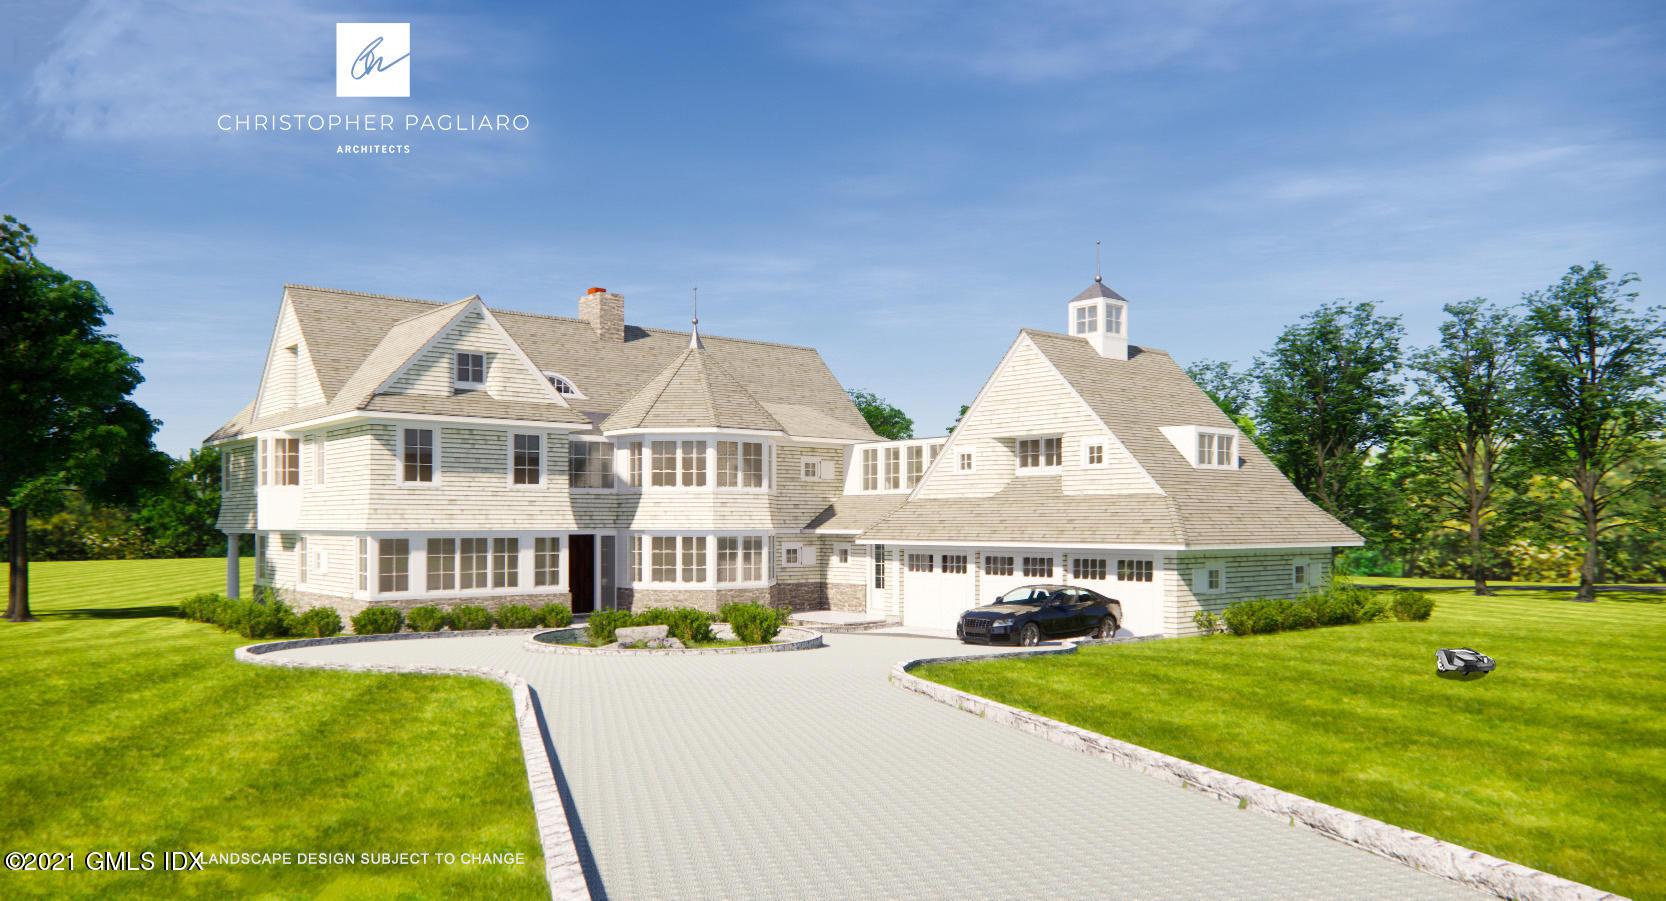 7 Stillman Lane, Greenwich, Connecticut 06831, 6 Bedrooms Bedrooms, ,6 BathroomsBathrooms,Single family,For sale,Stillman,112019